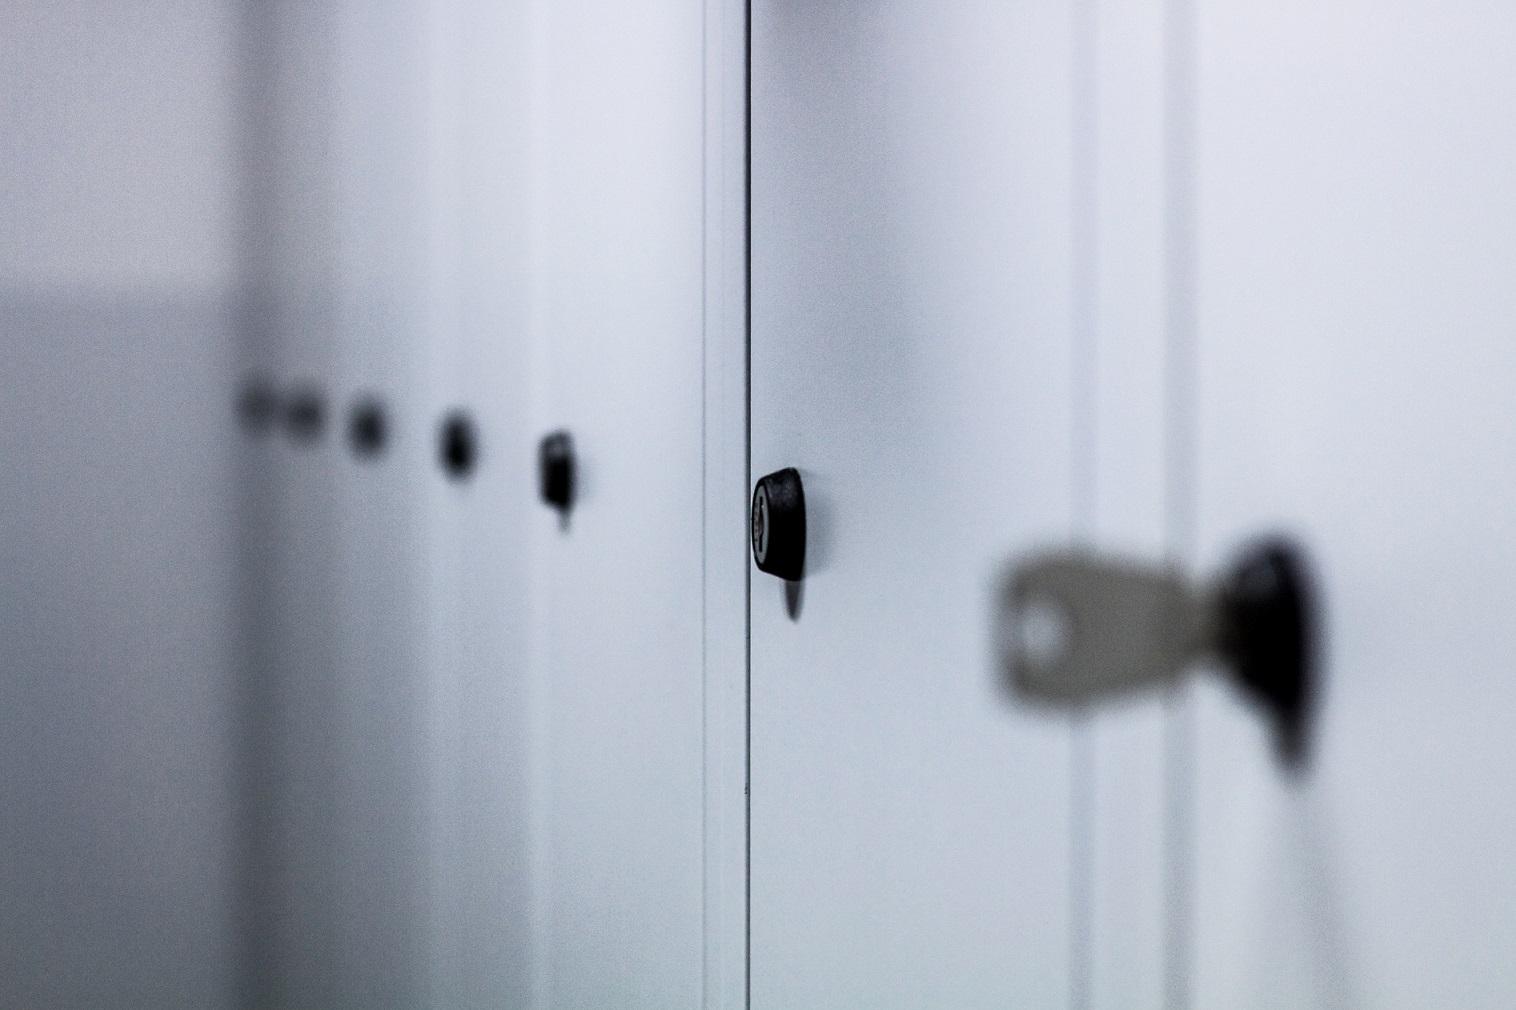 taquilla llave cerrada